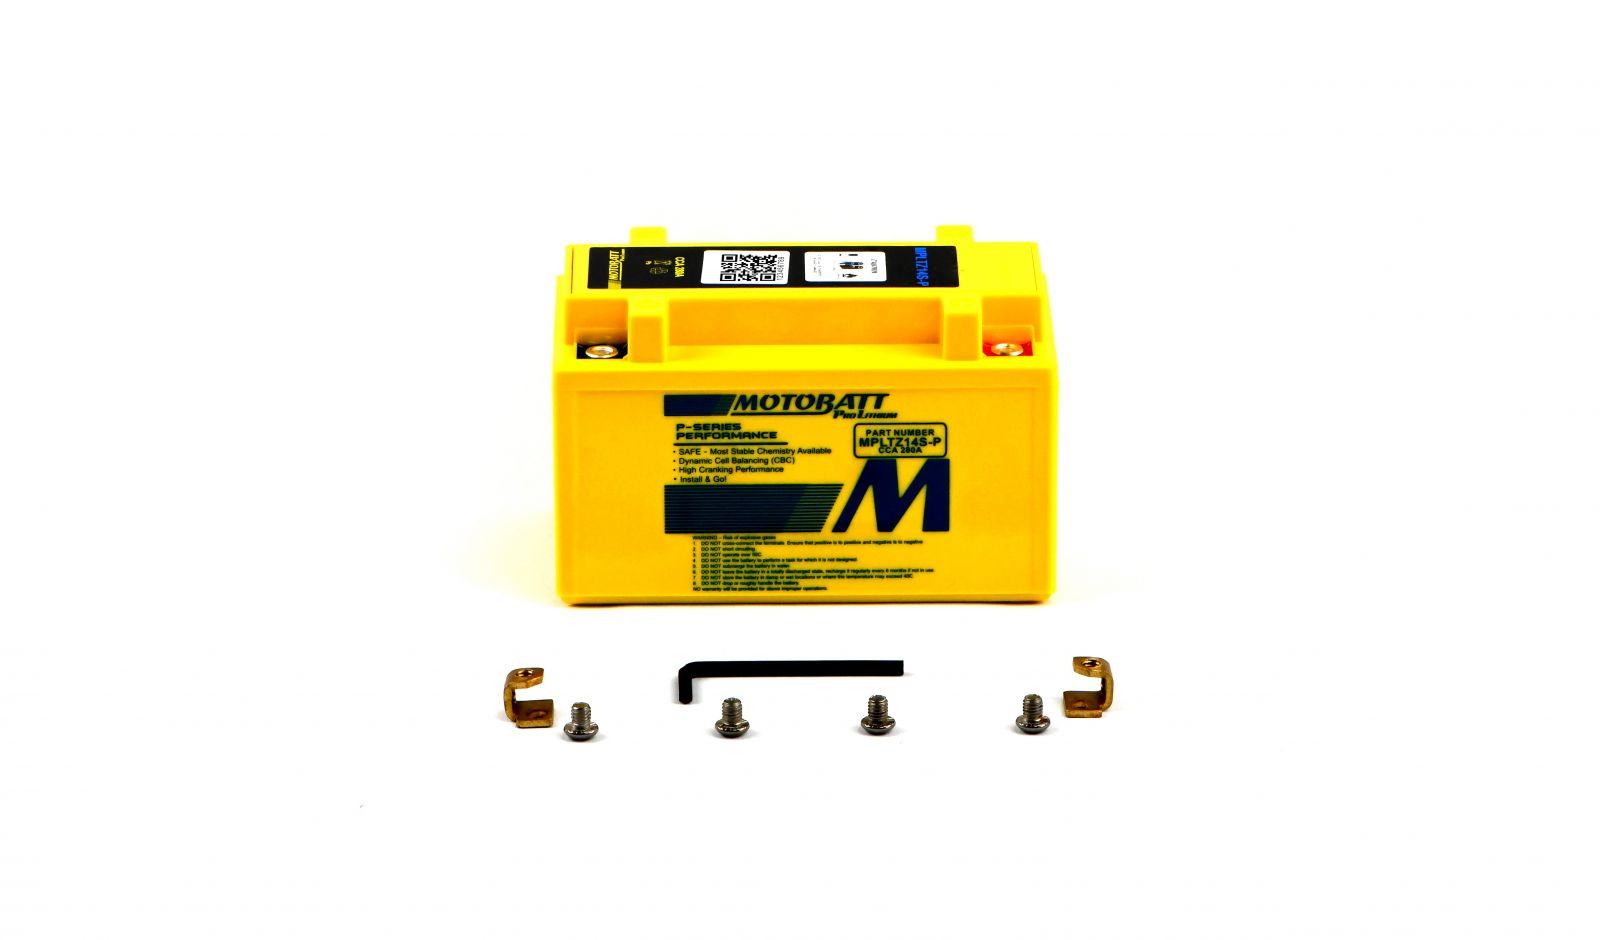 Motobatt Lithium Batteries - 501147ML image